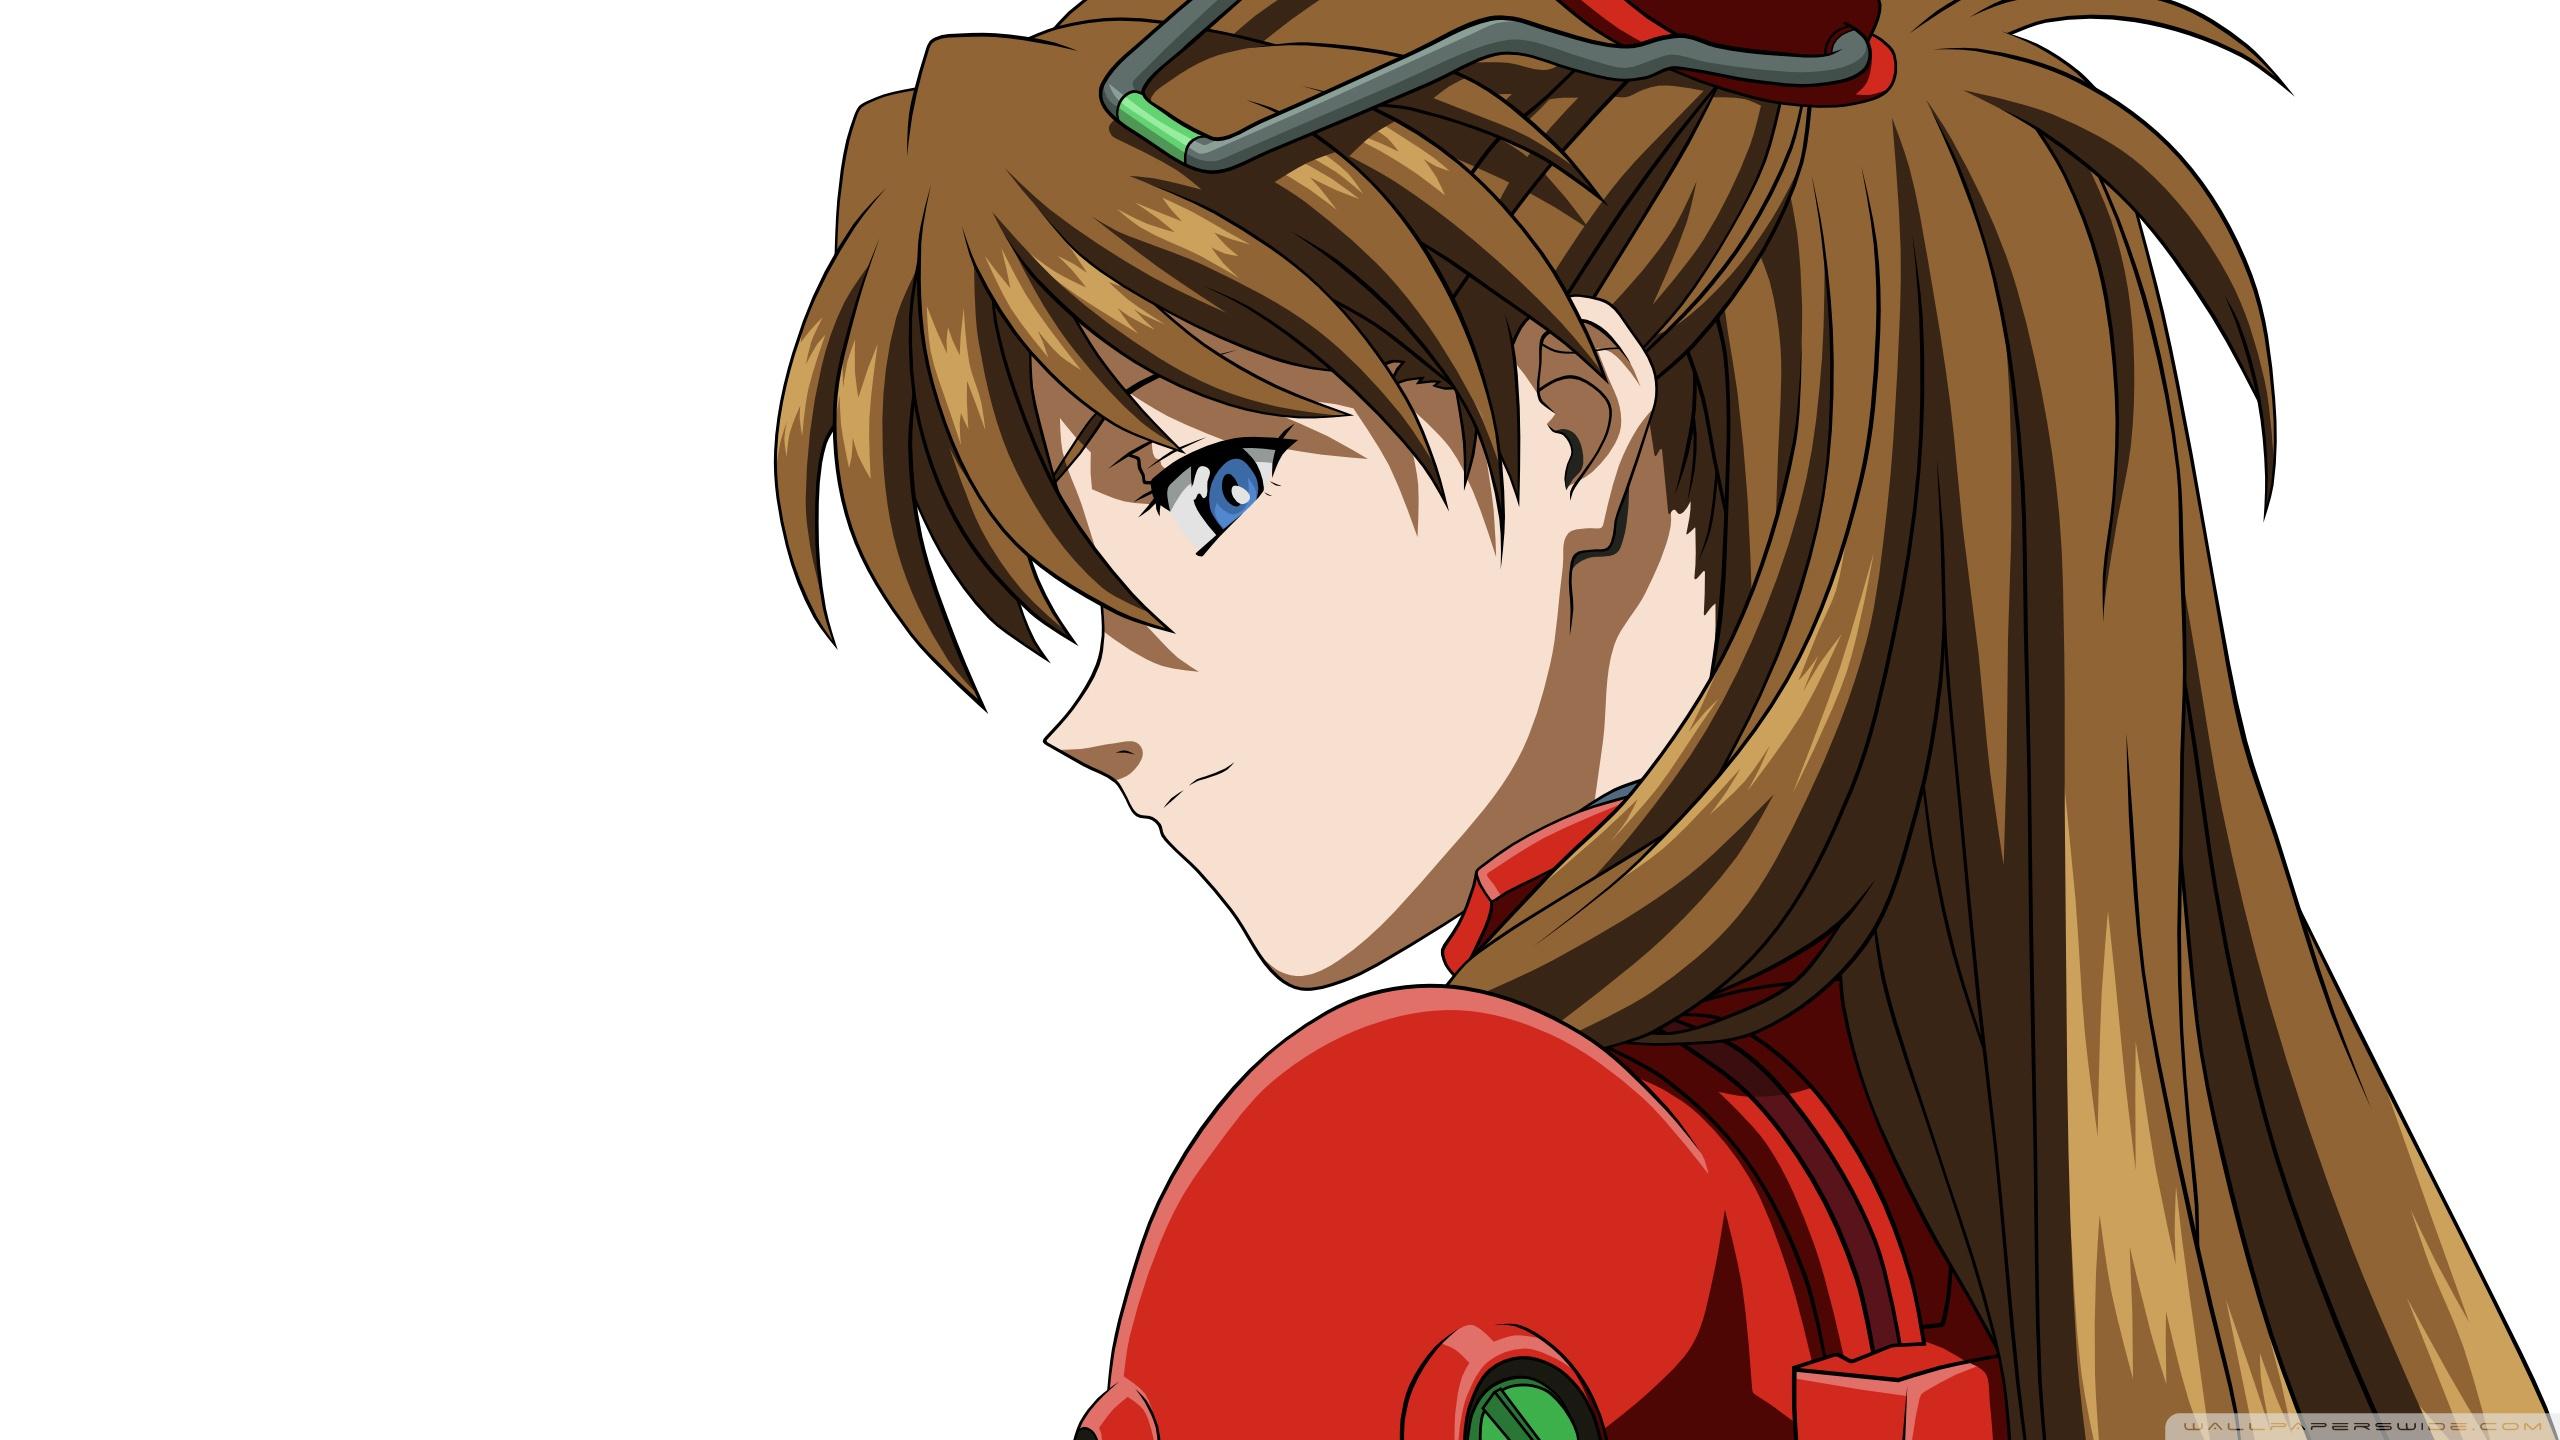 Neon Genesis Evangelion Asuka Langley Soryu HD desktop wallpaper